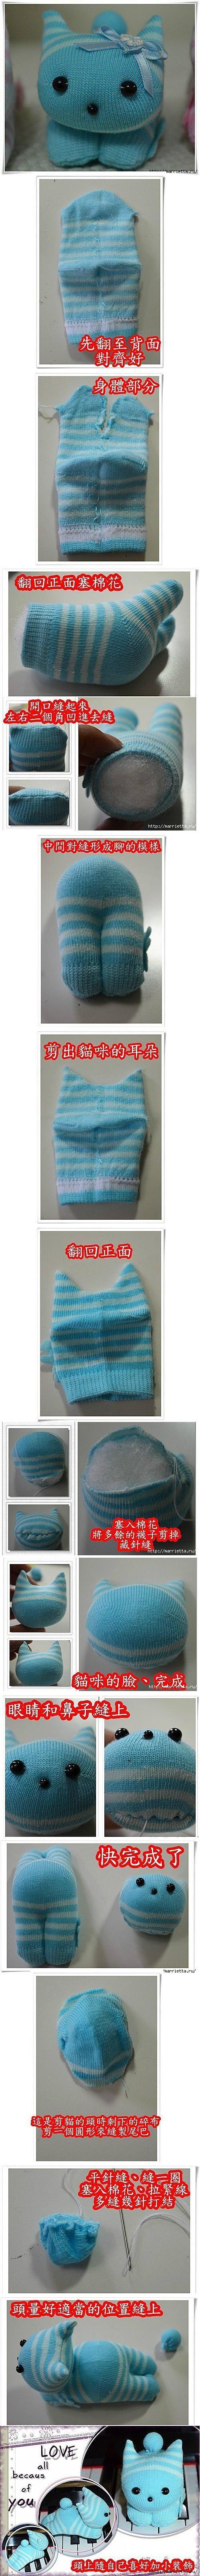 DIY Cute Sock | http://stuffedanimals.lemoncoin.org